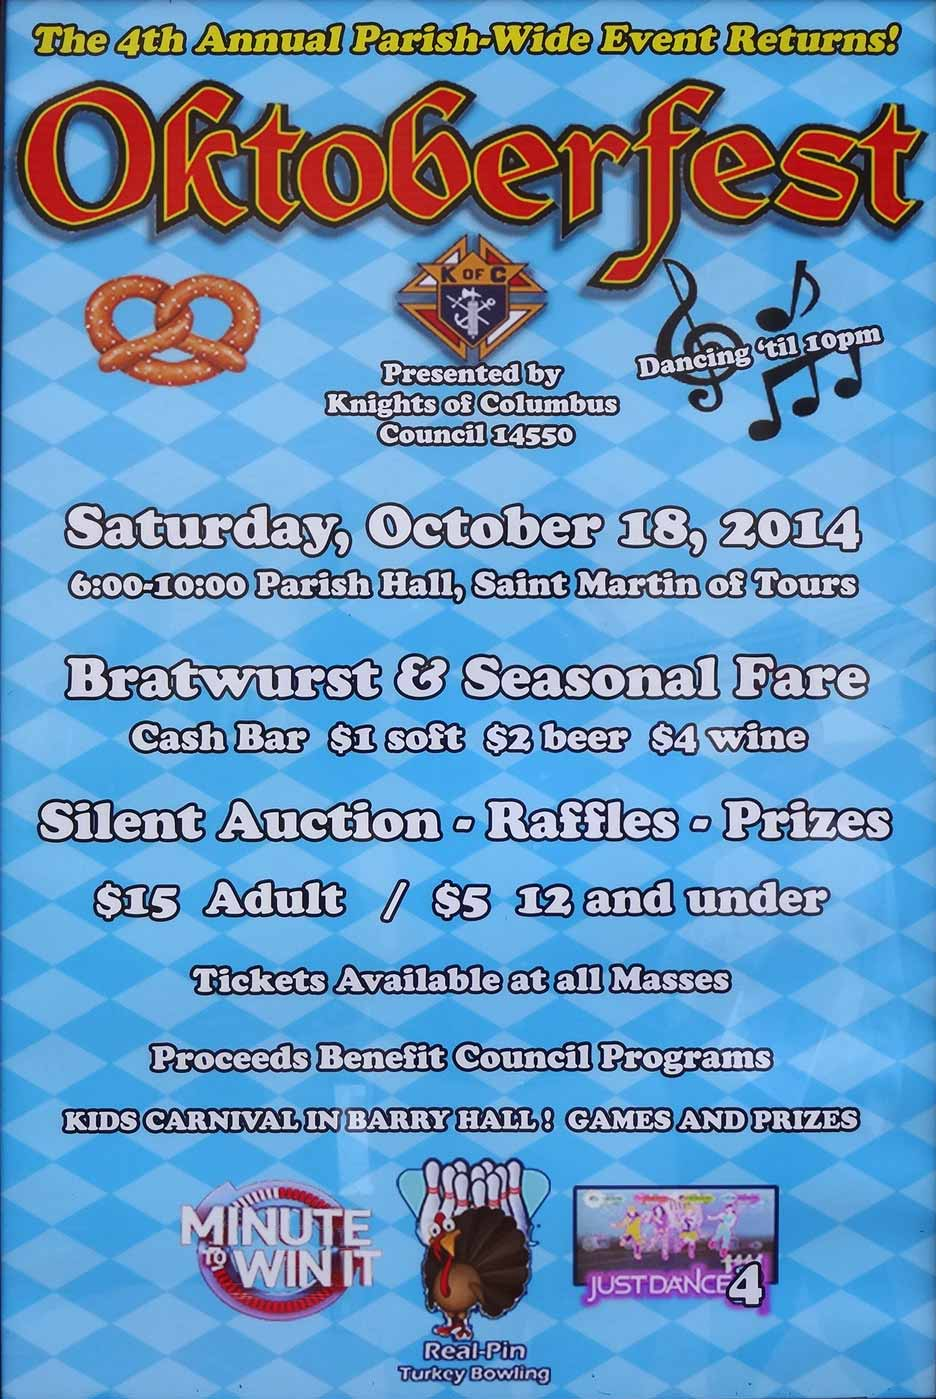 Octoberfest-2014